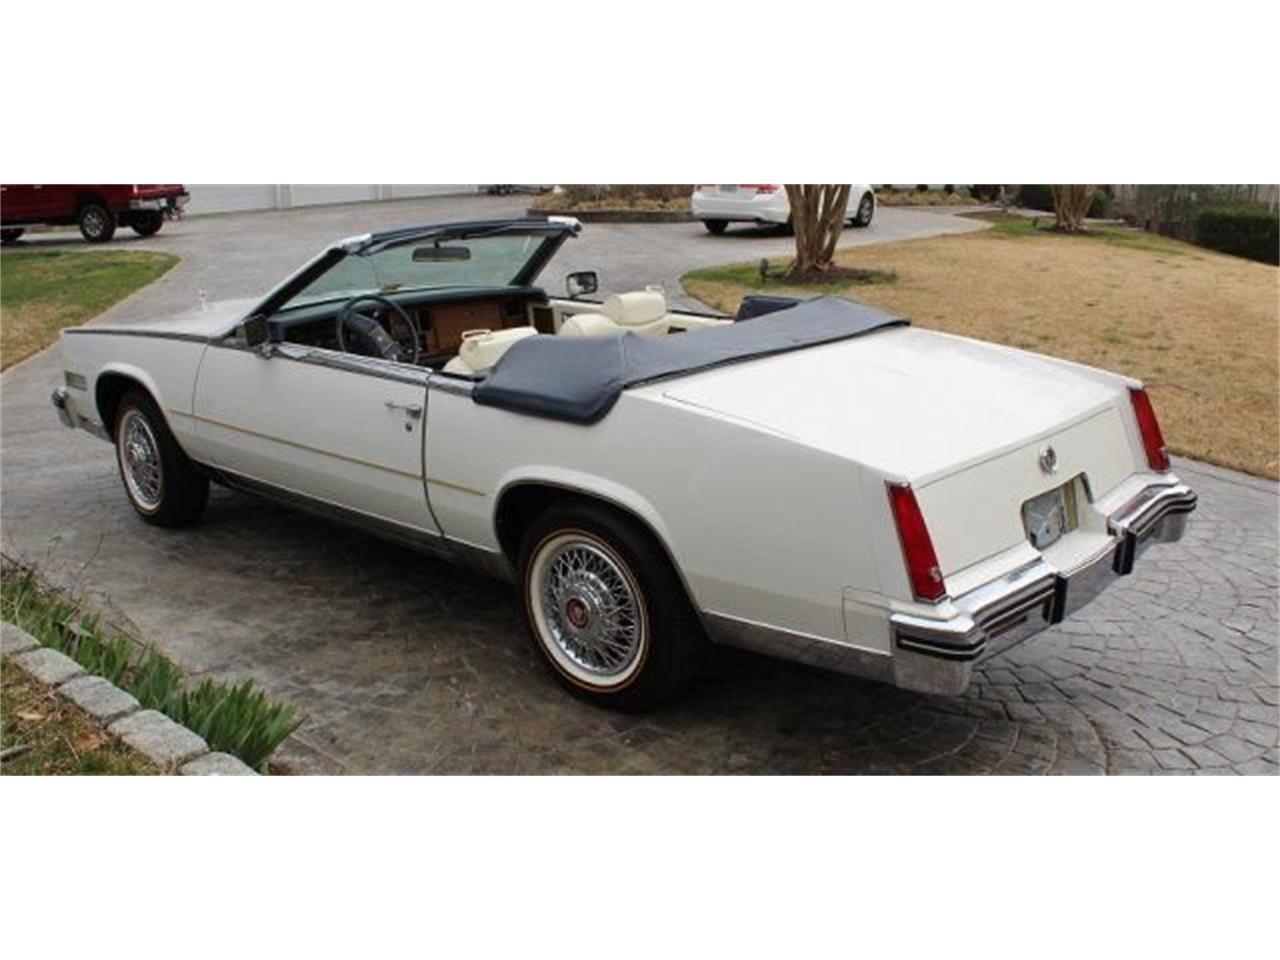 1984 Cadillac Eldorado (CC-1273277) for sale in Raleigh, North Carolina